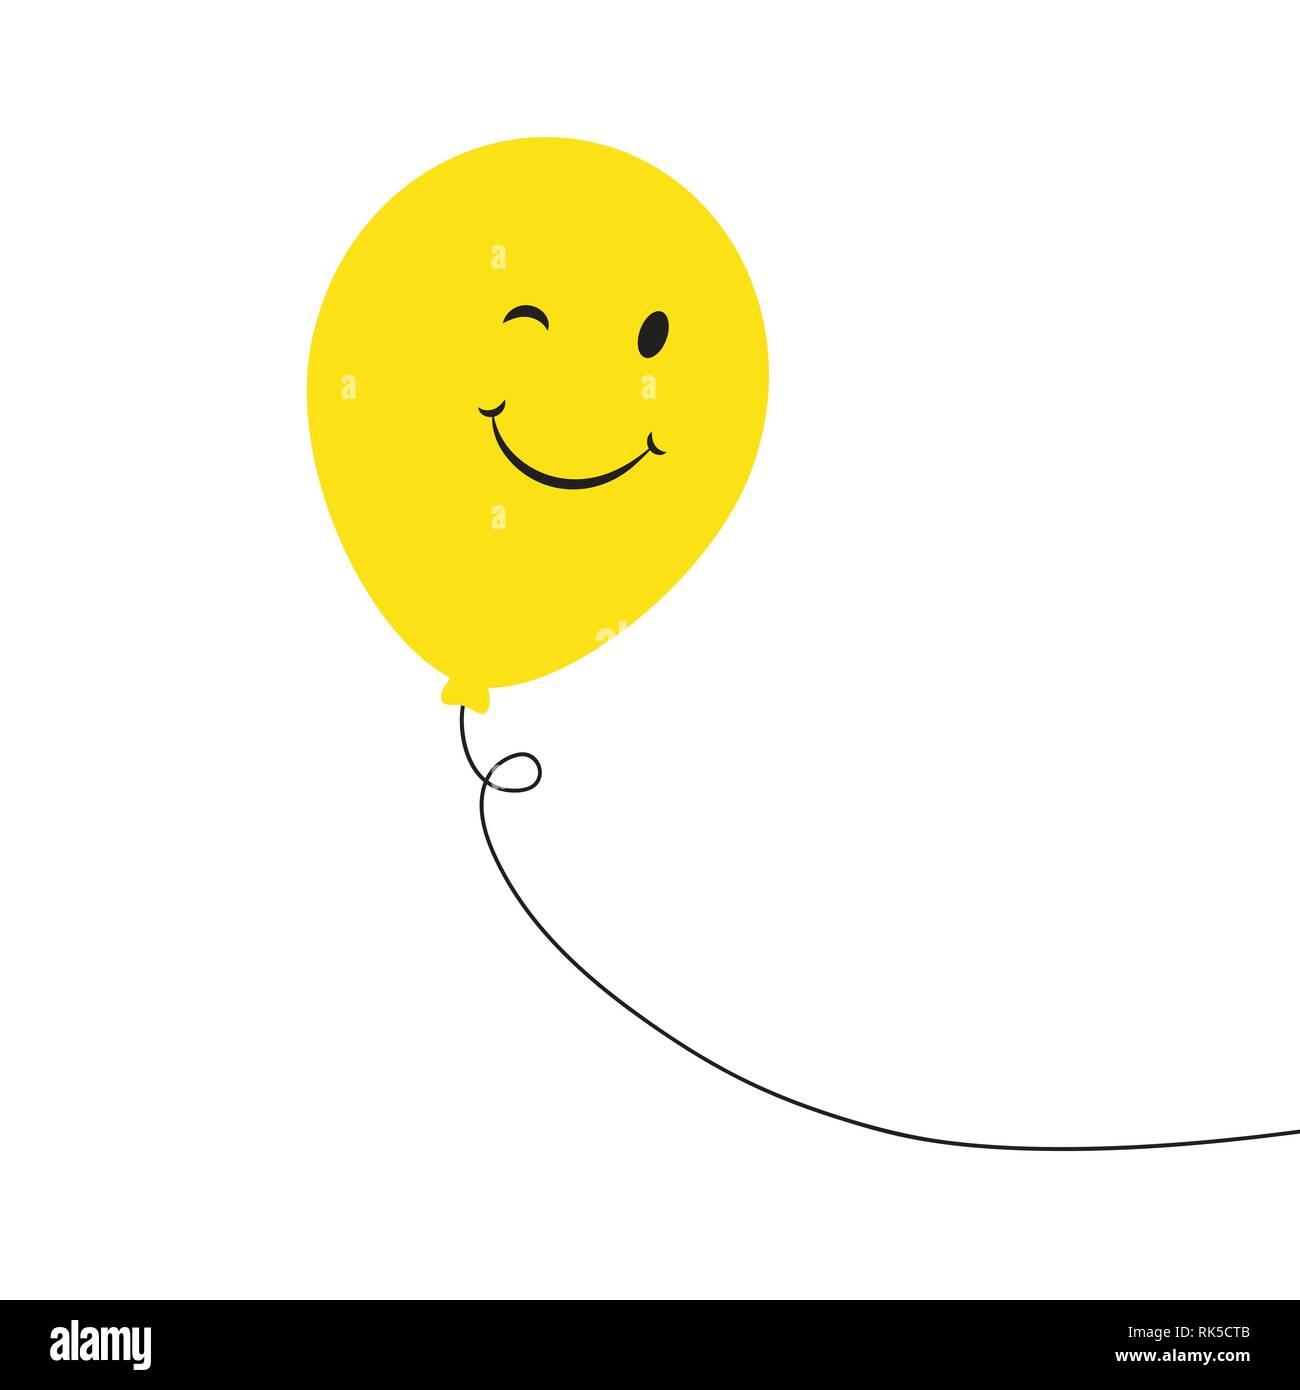 Balloon. Smiley Face. Yellow Smile Balloon. Happy Birthday